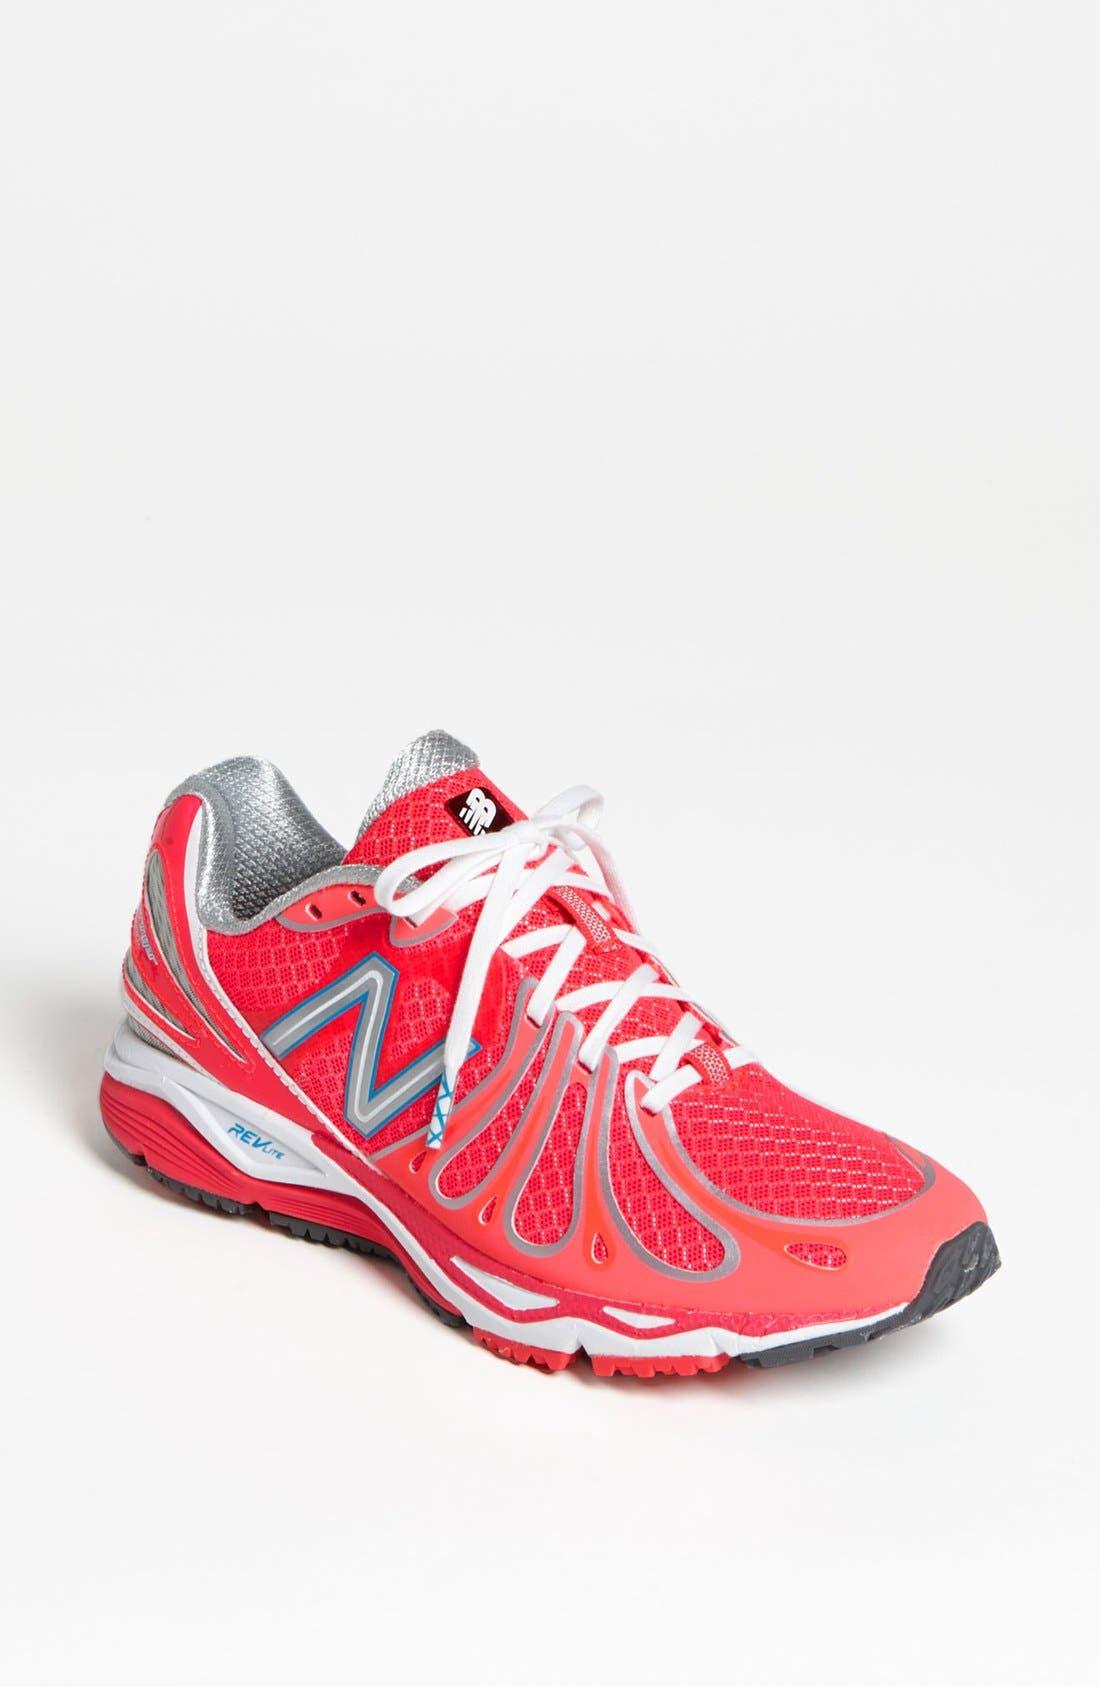 Main Image - New Balance '890V3' Running Shoe (Women) (Regular Retail Price: $109.95)